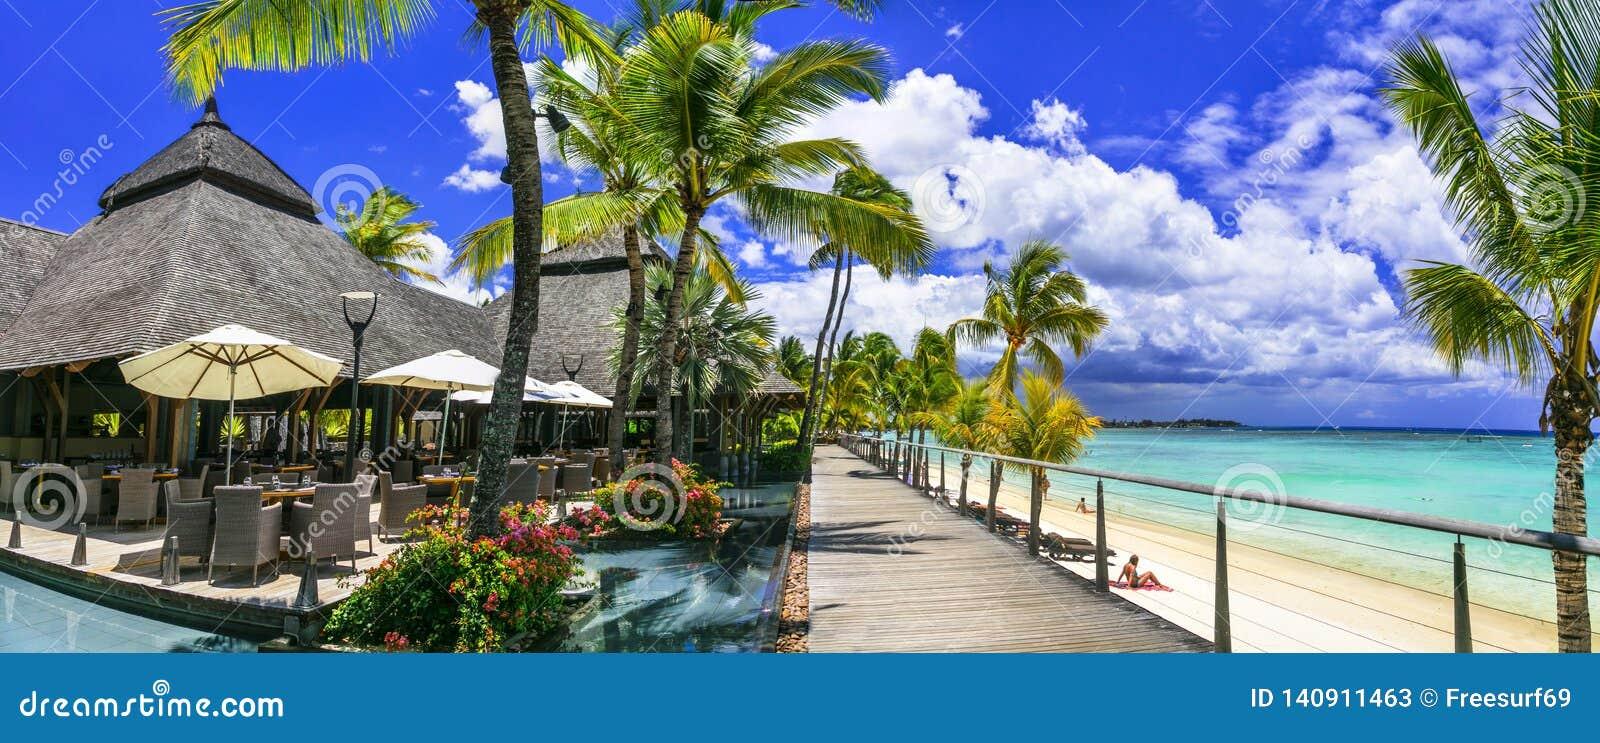 Relaxing bar in palm shade and pool bnear the beach. tropical paradise Mauritius island